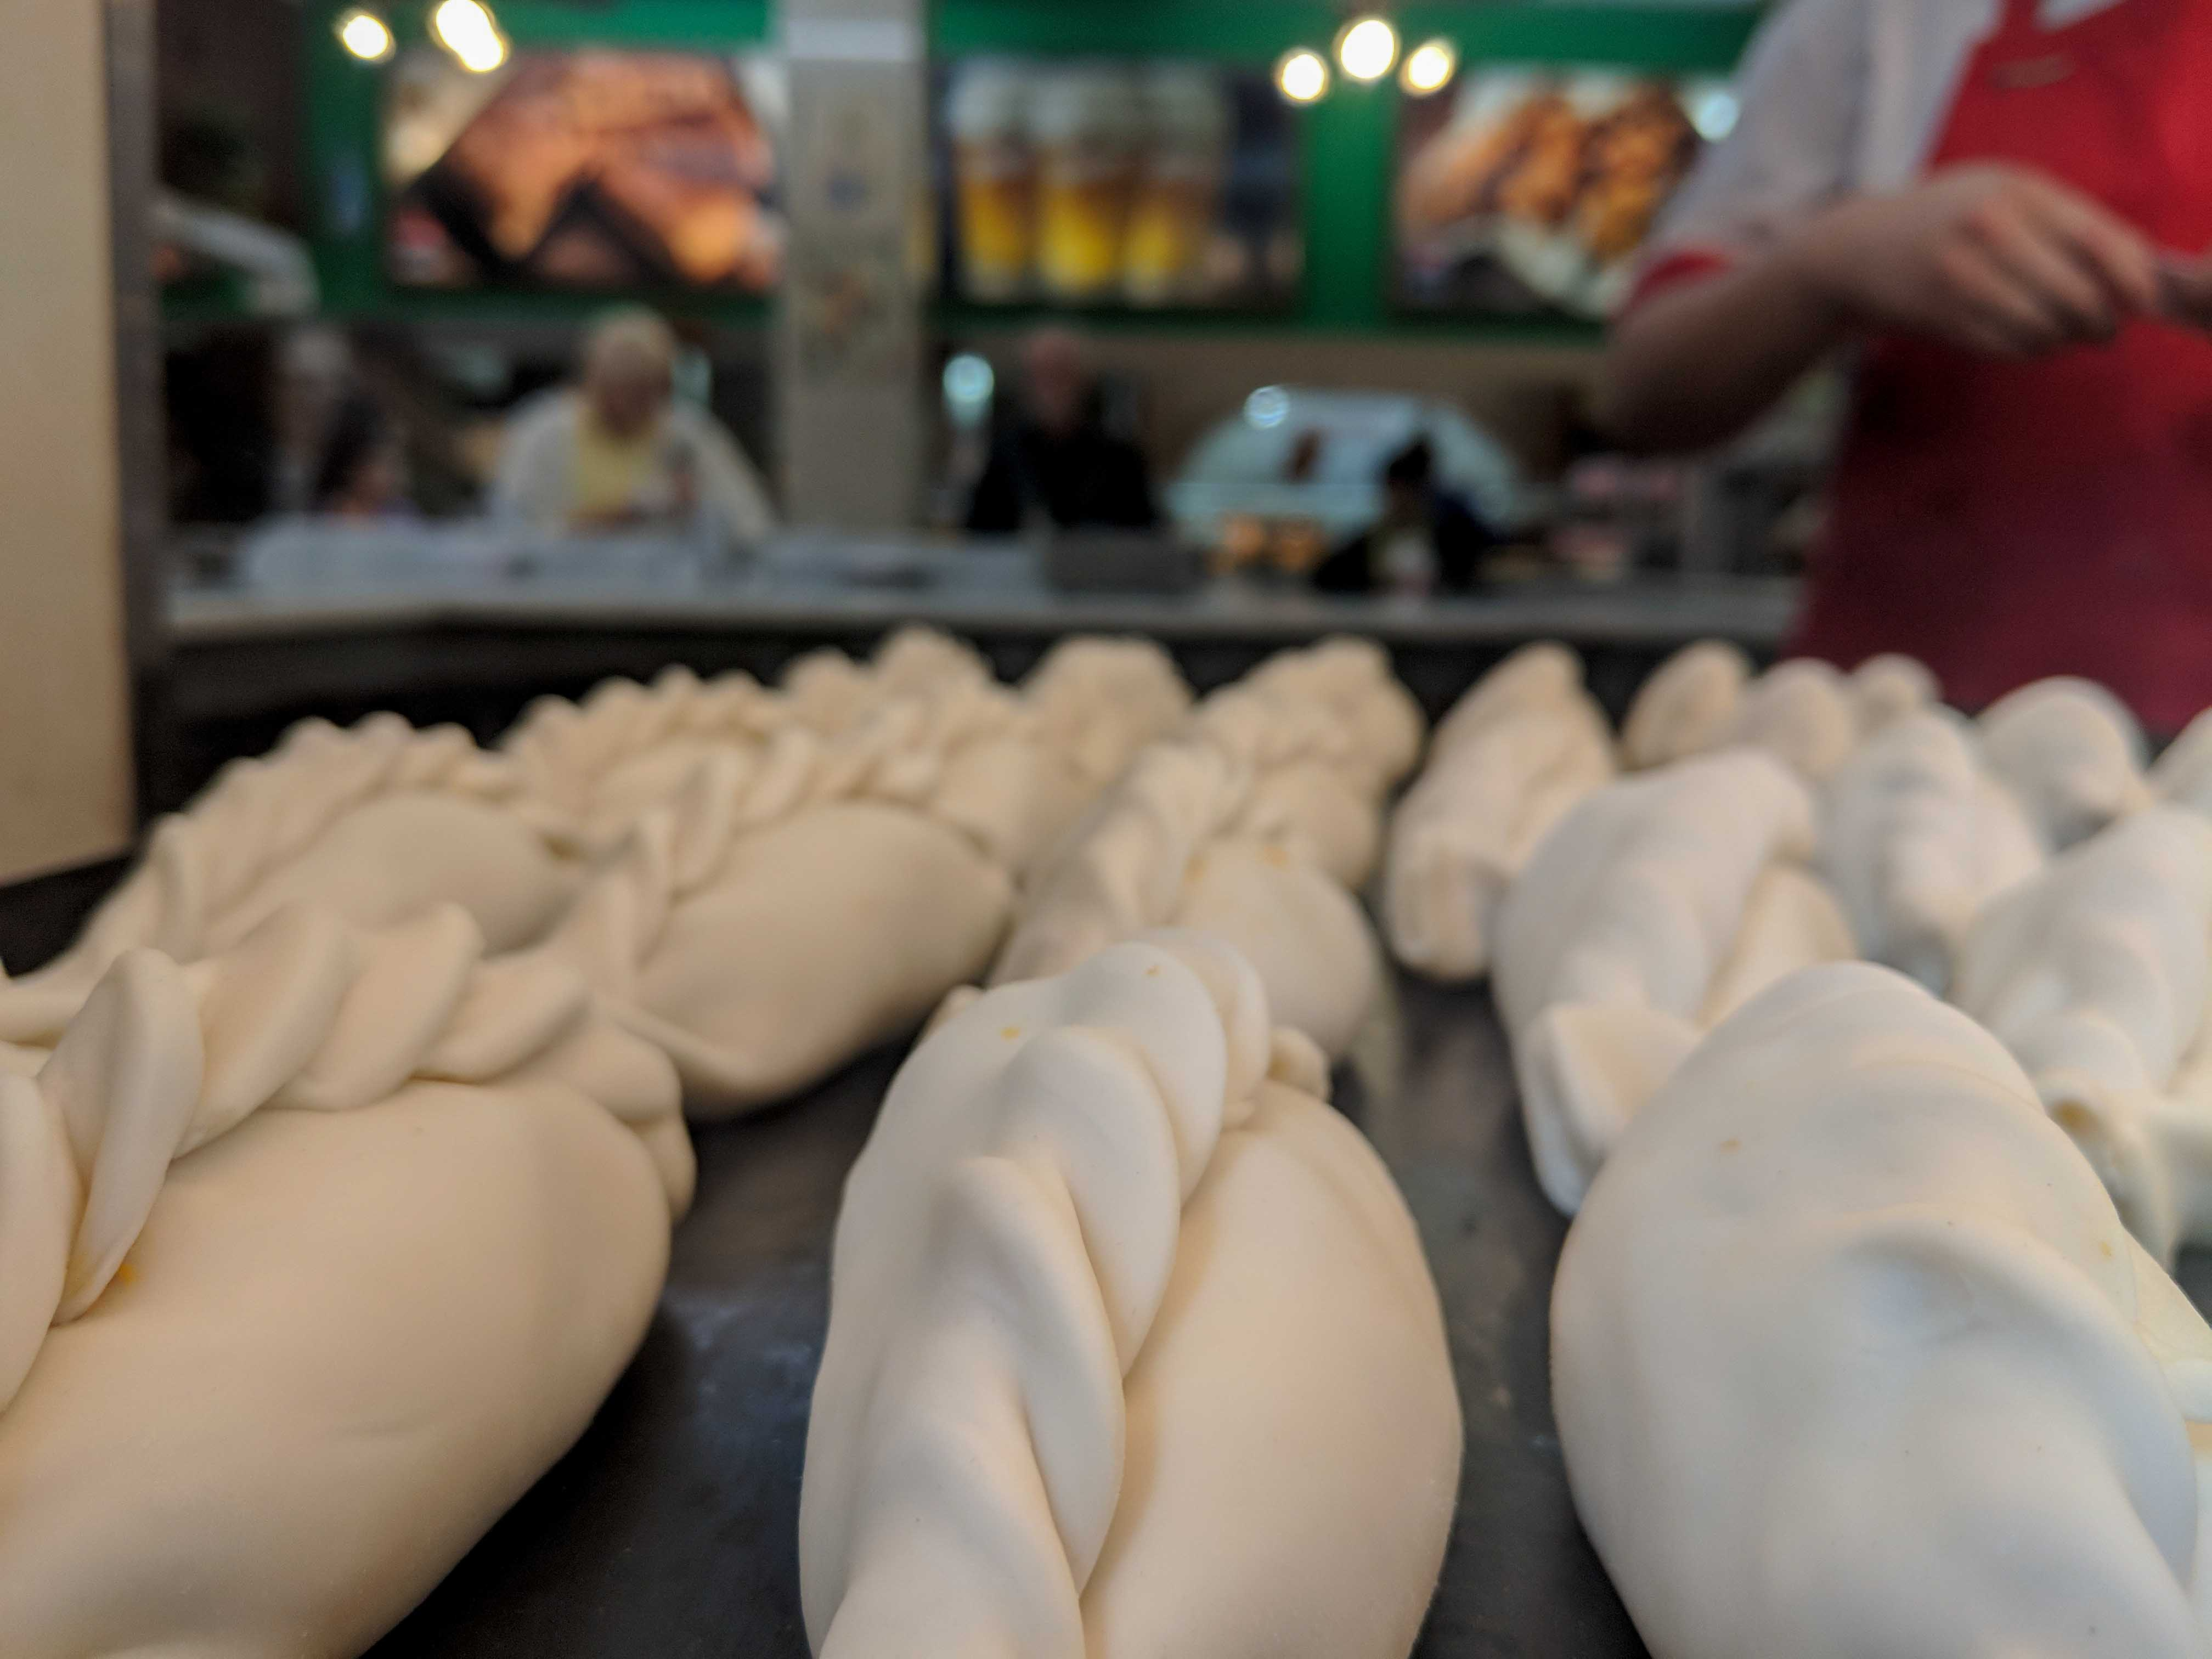 empanadas in Buenos Aires